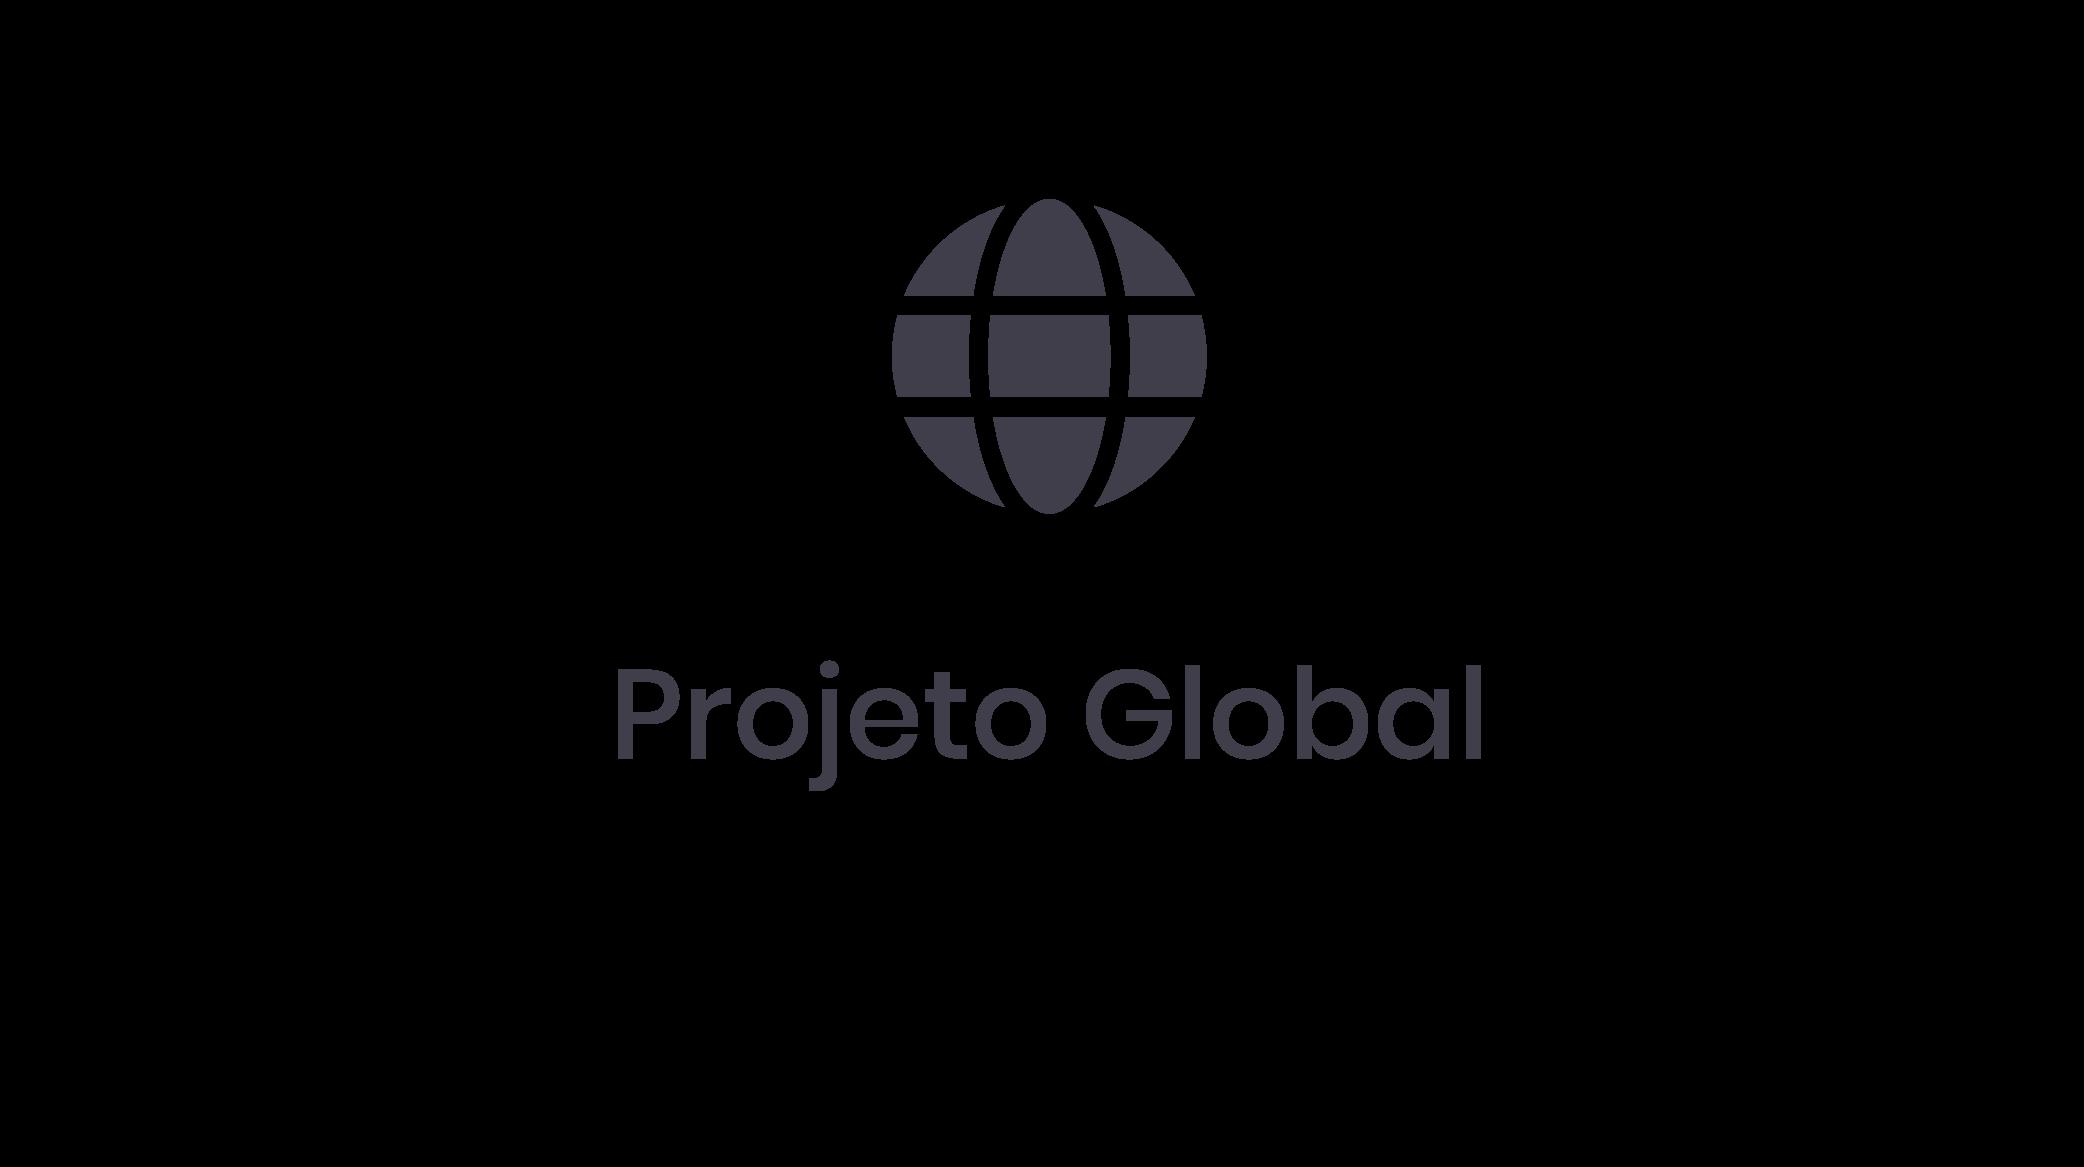 Projeto Global